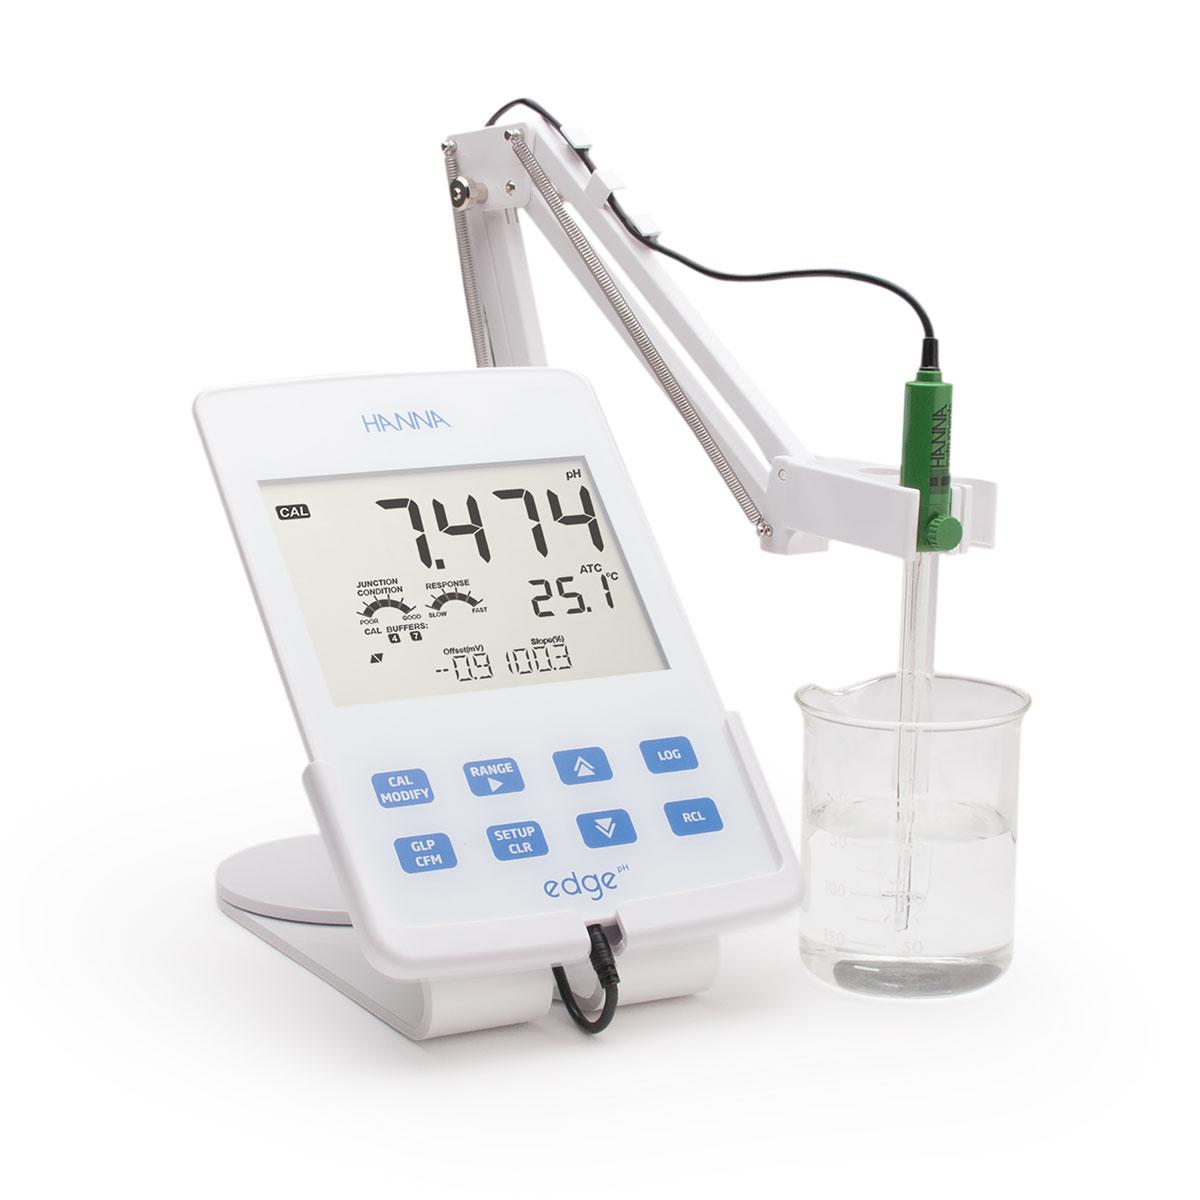 edge pH/ORP Meter In Cradle